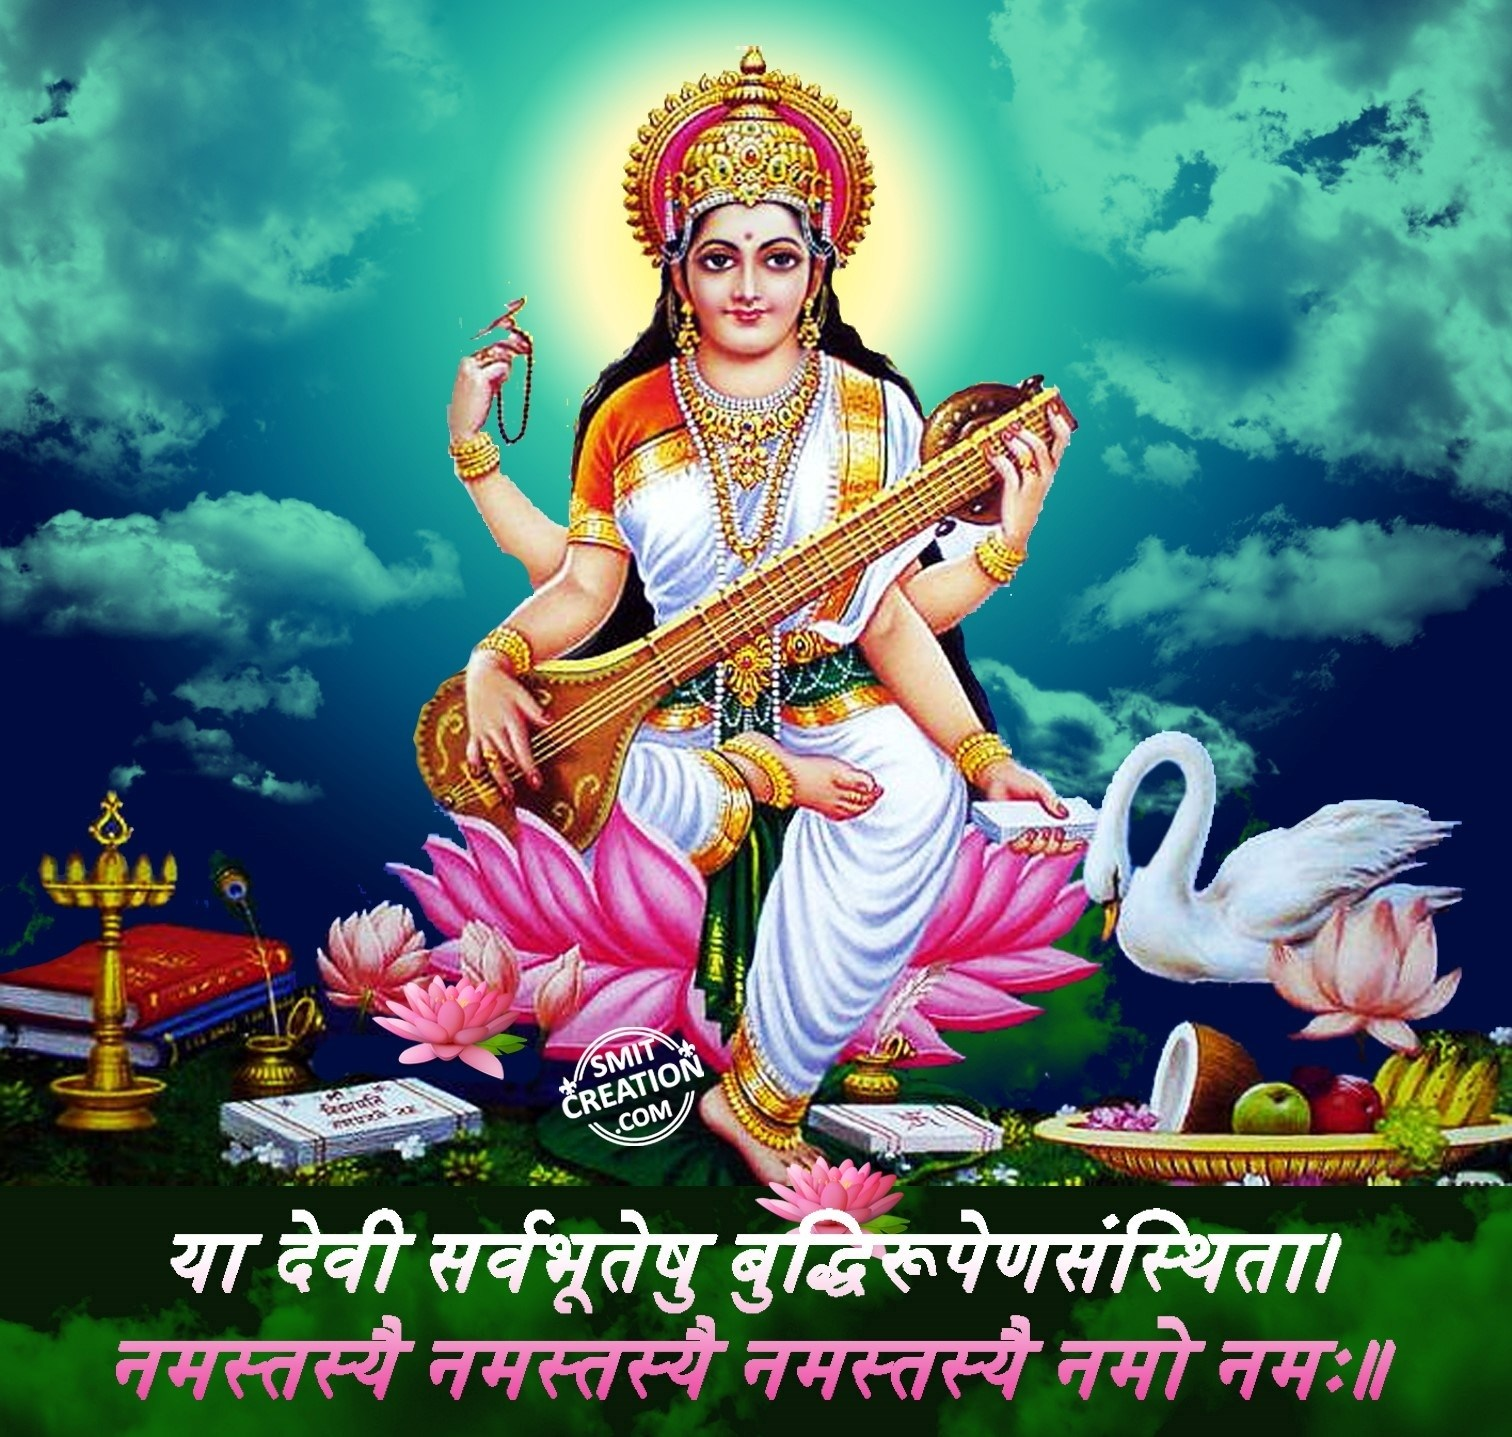 saraswati puja sarswati mantra smitcreationcom